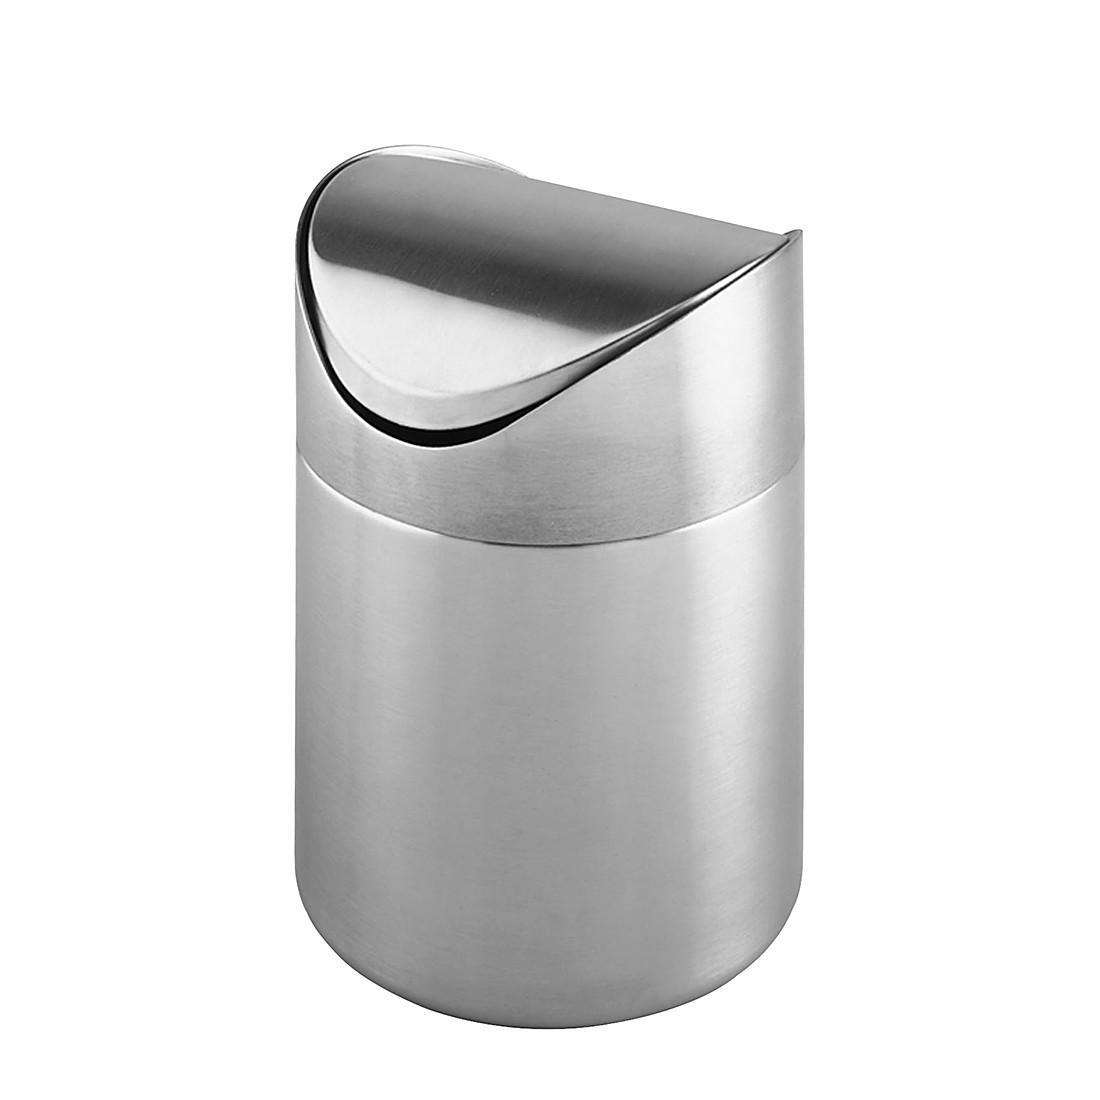 Cosmetica afvalbak Otranto (3L) - roestvrij staal, Wenko